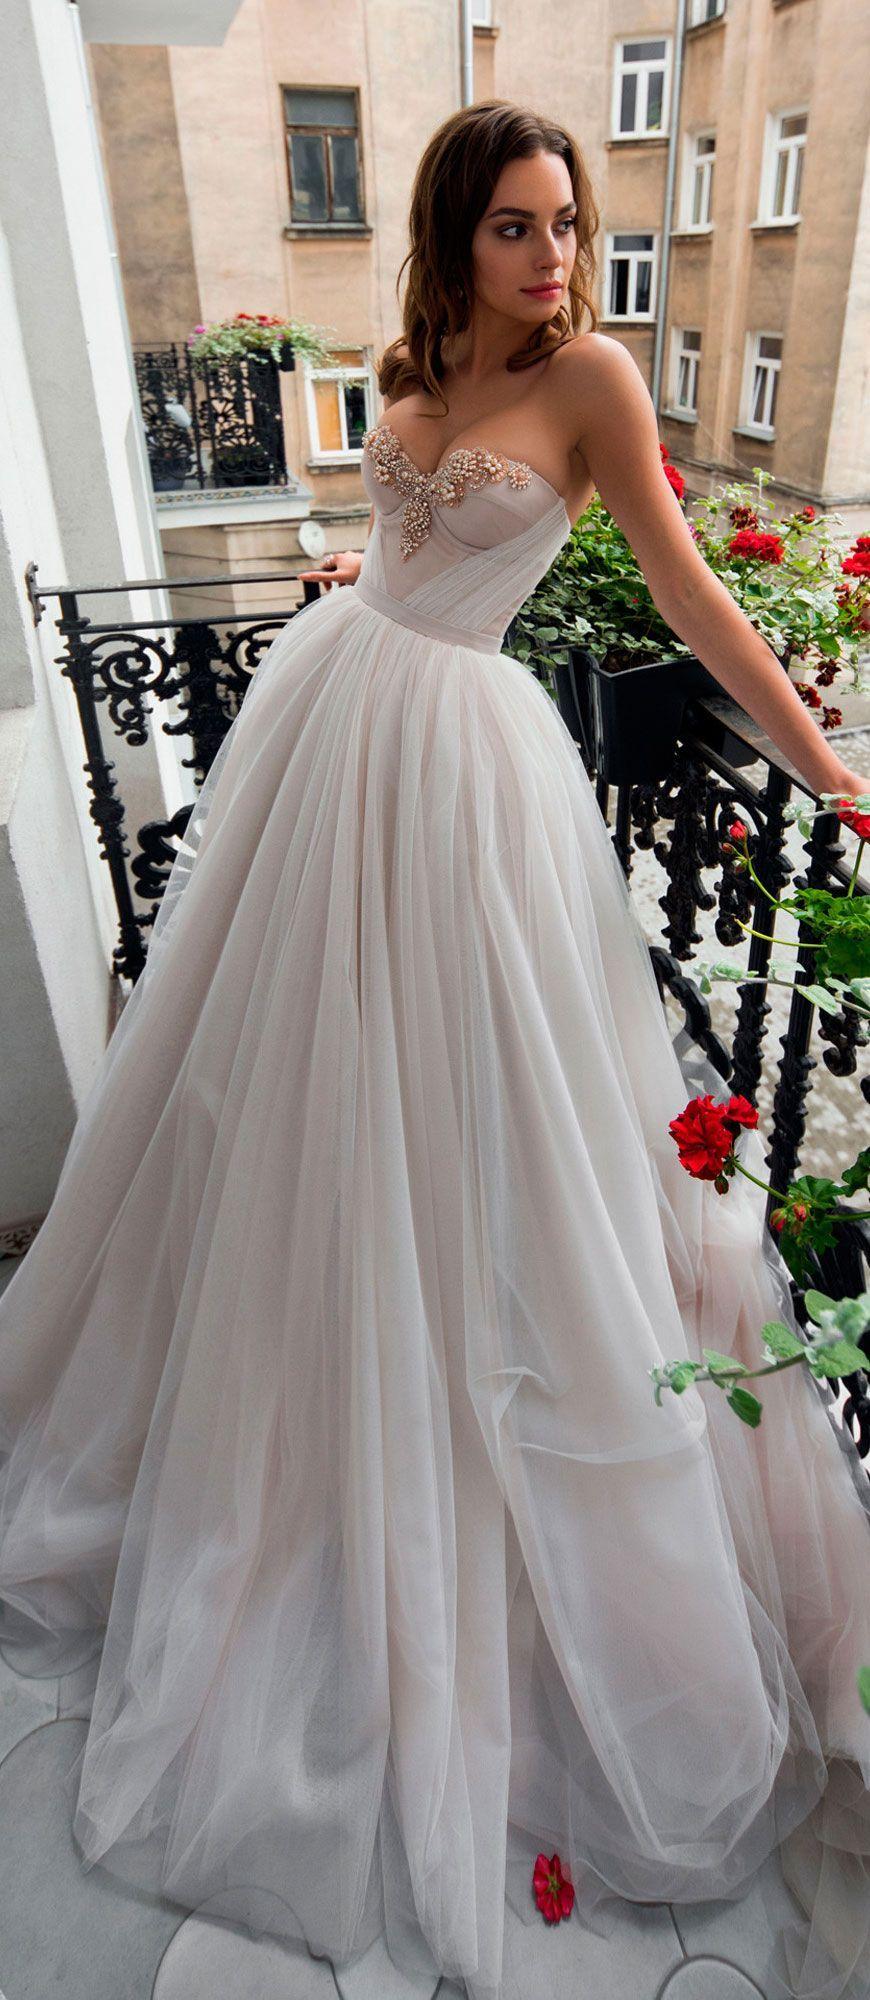 Blammobiamo wedding dresses weddingparty ideas pinterest